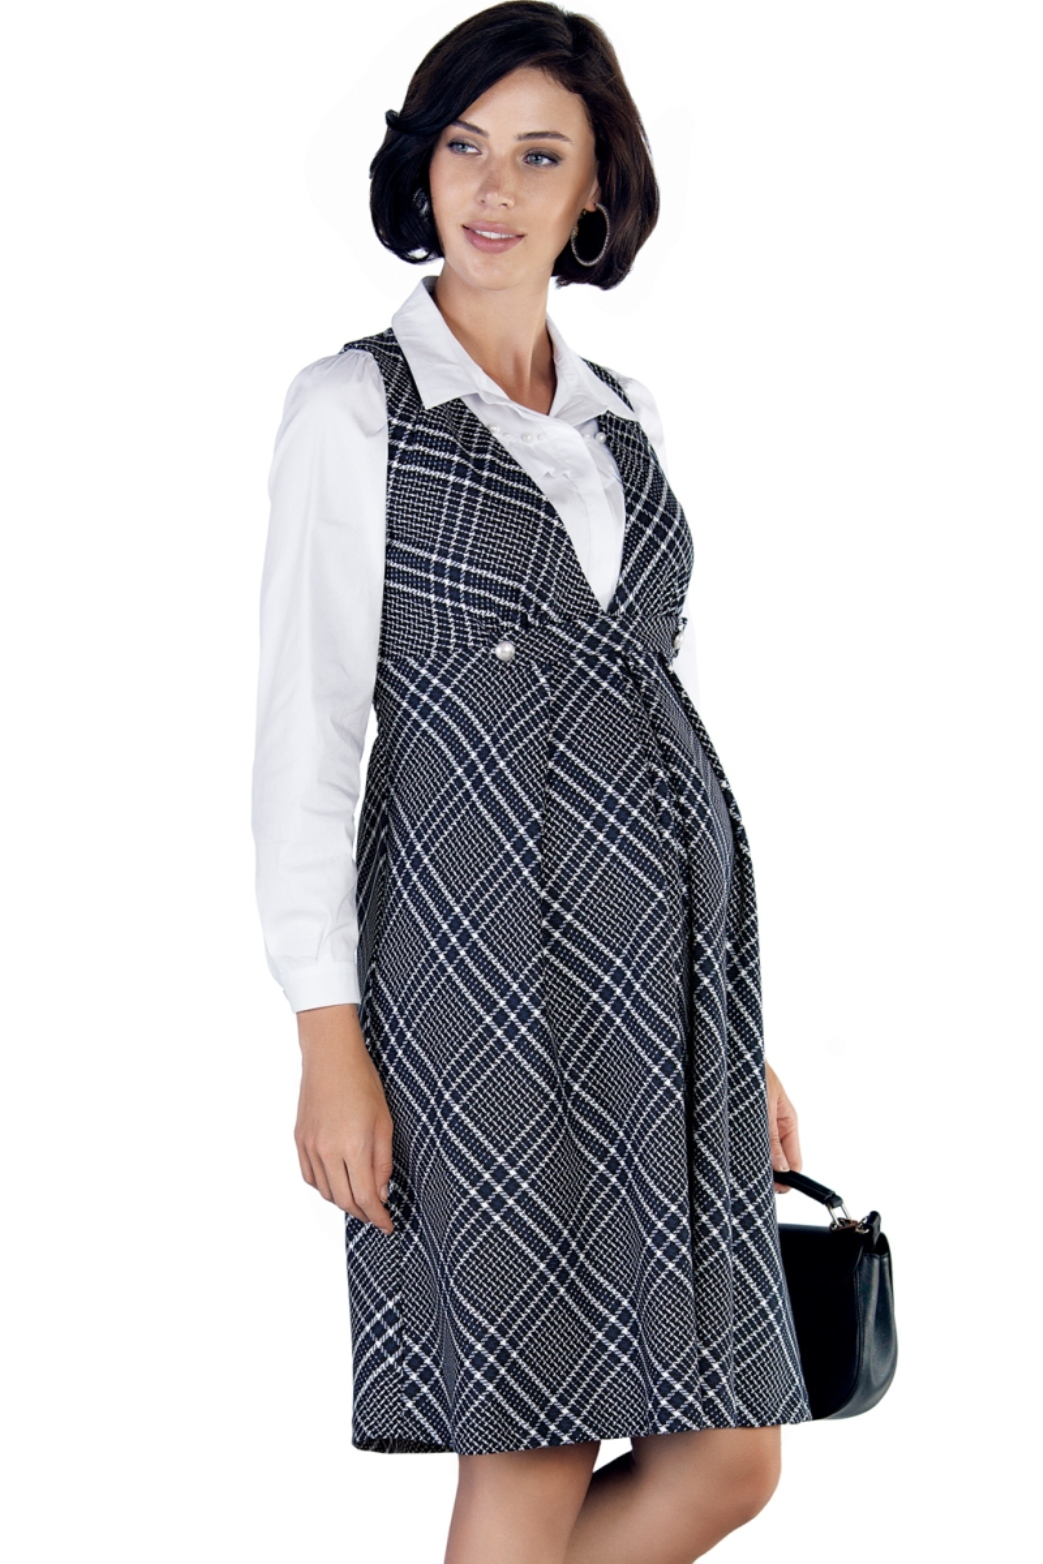 Сарафан для беременных 09768 черно-белый